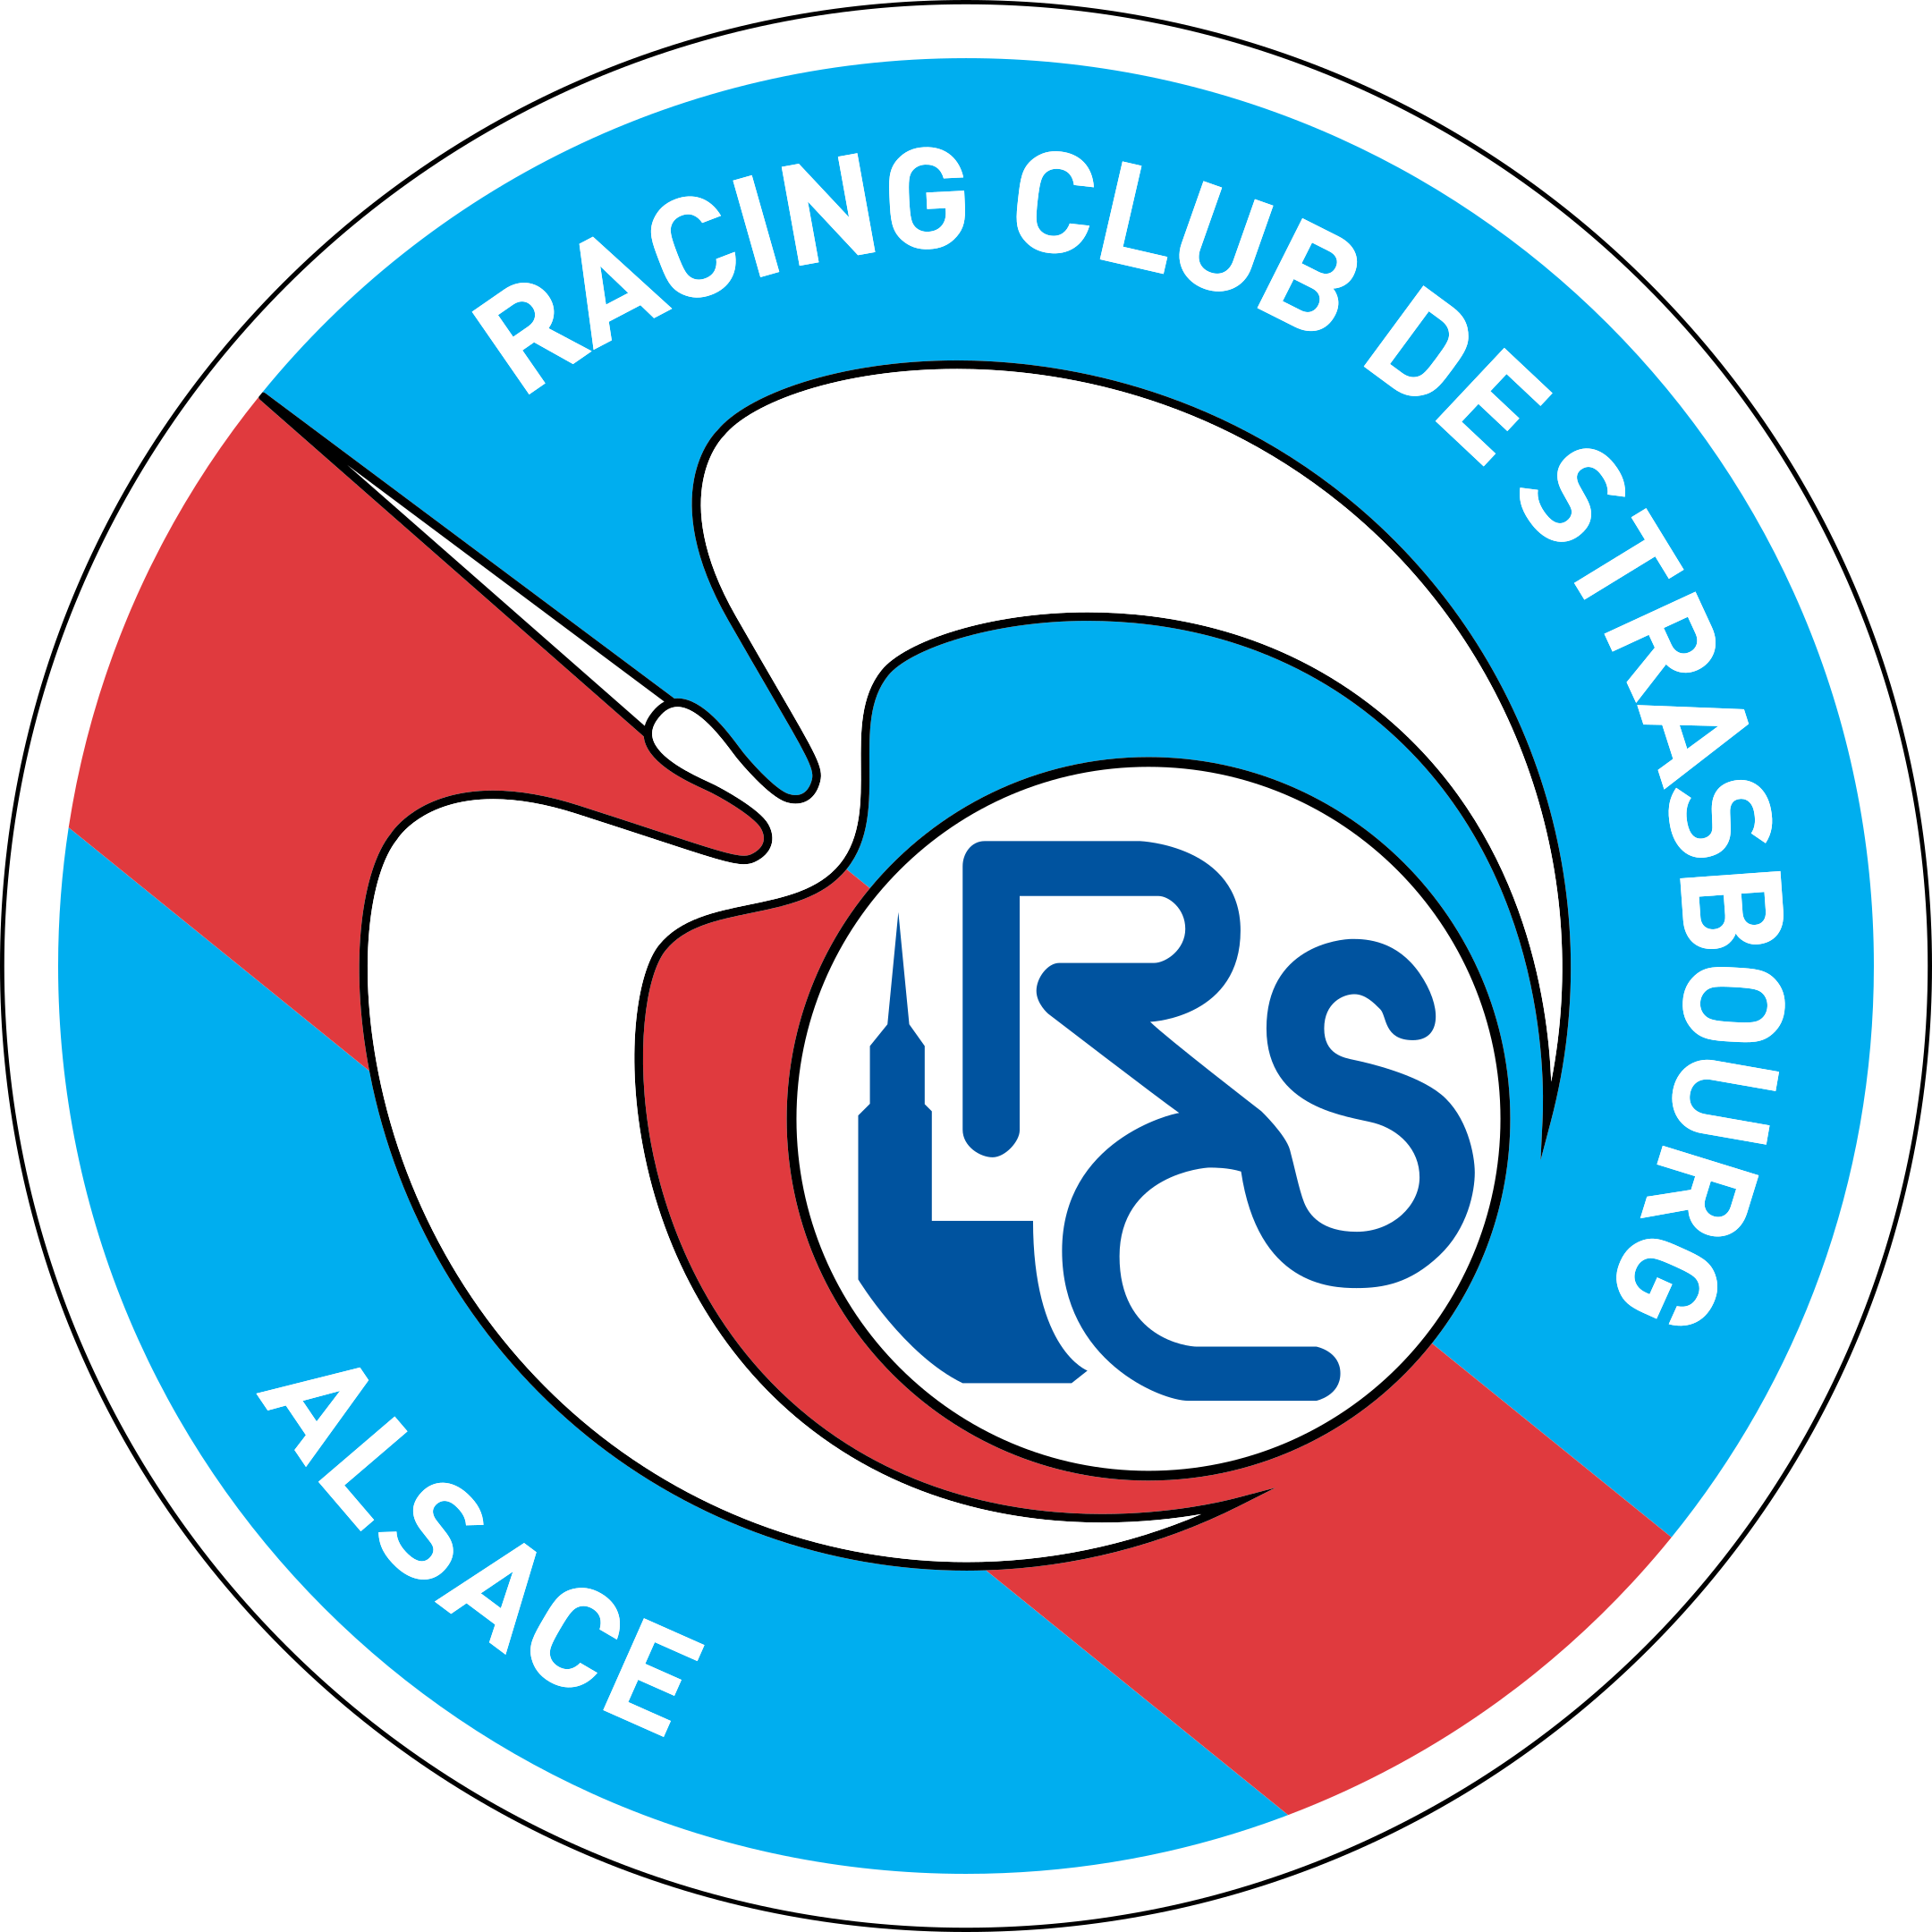 rc-strasbourg-logo-1